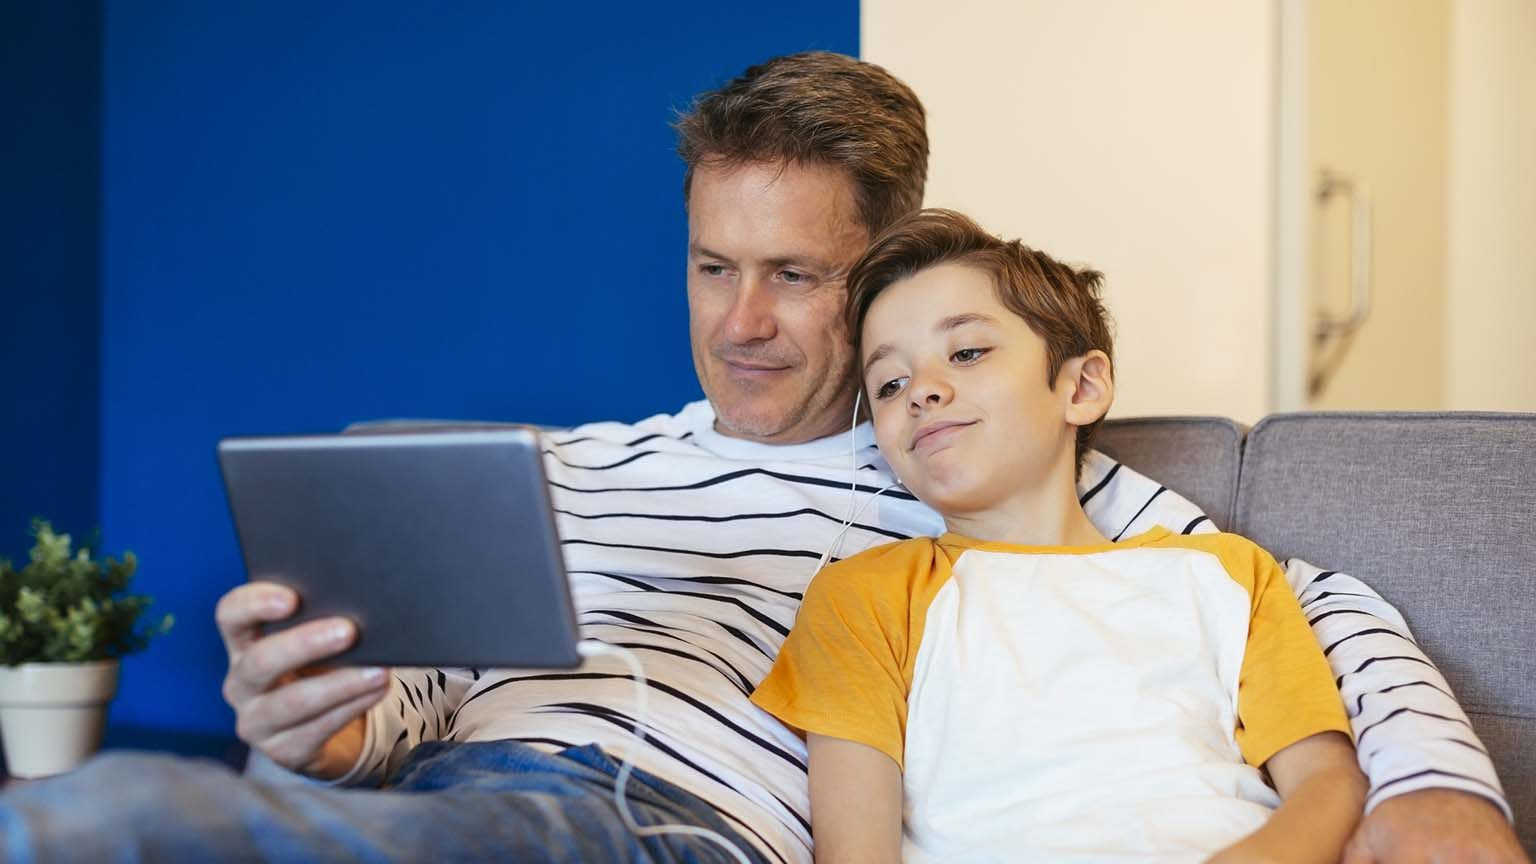 man and son watching ipad